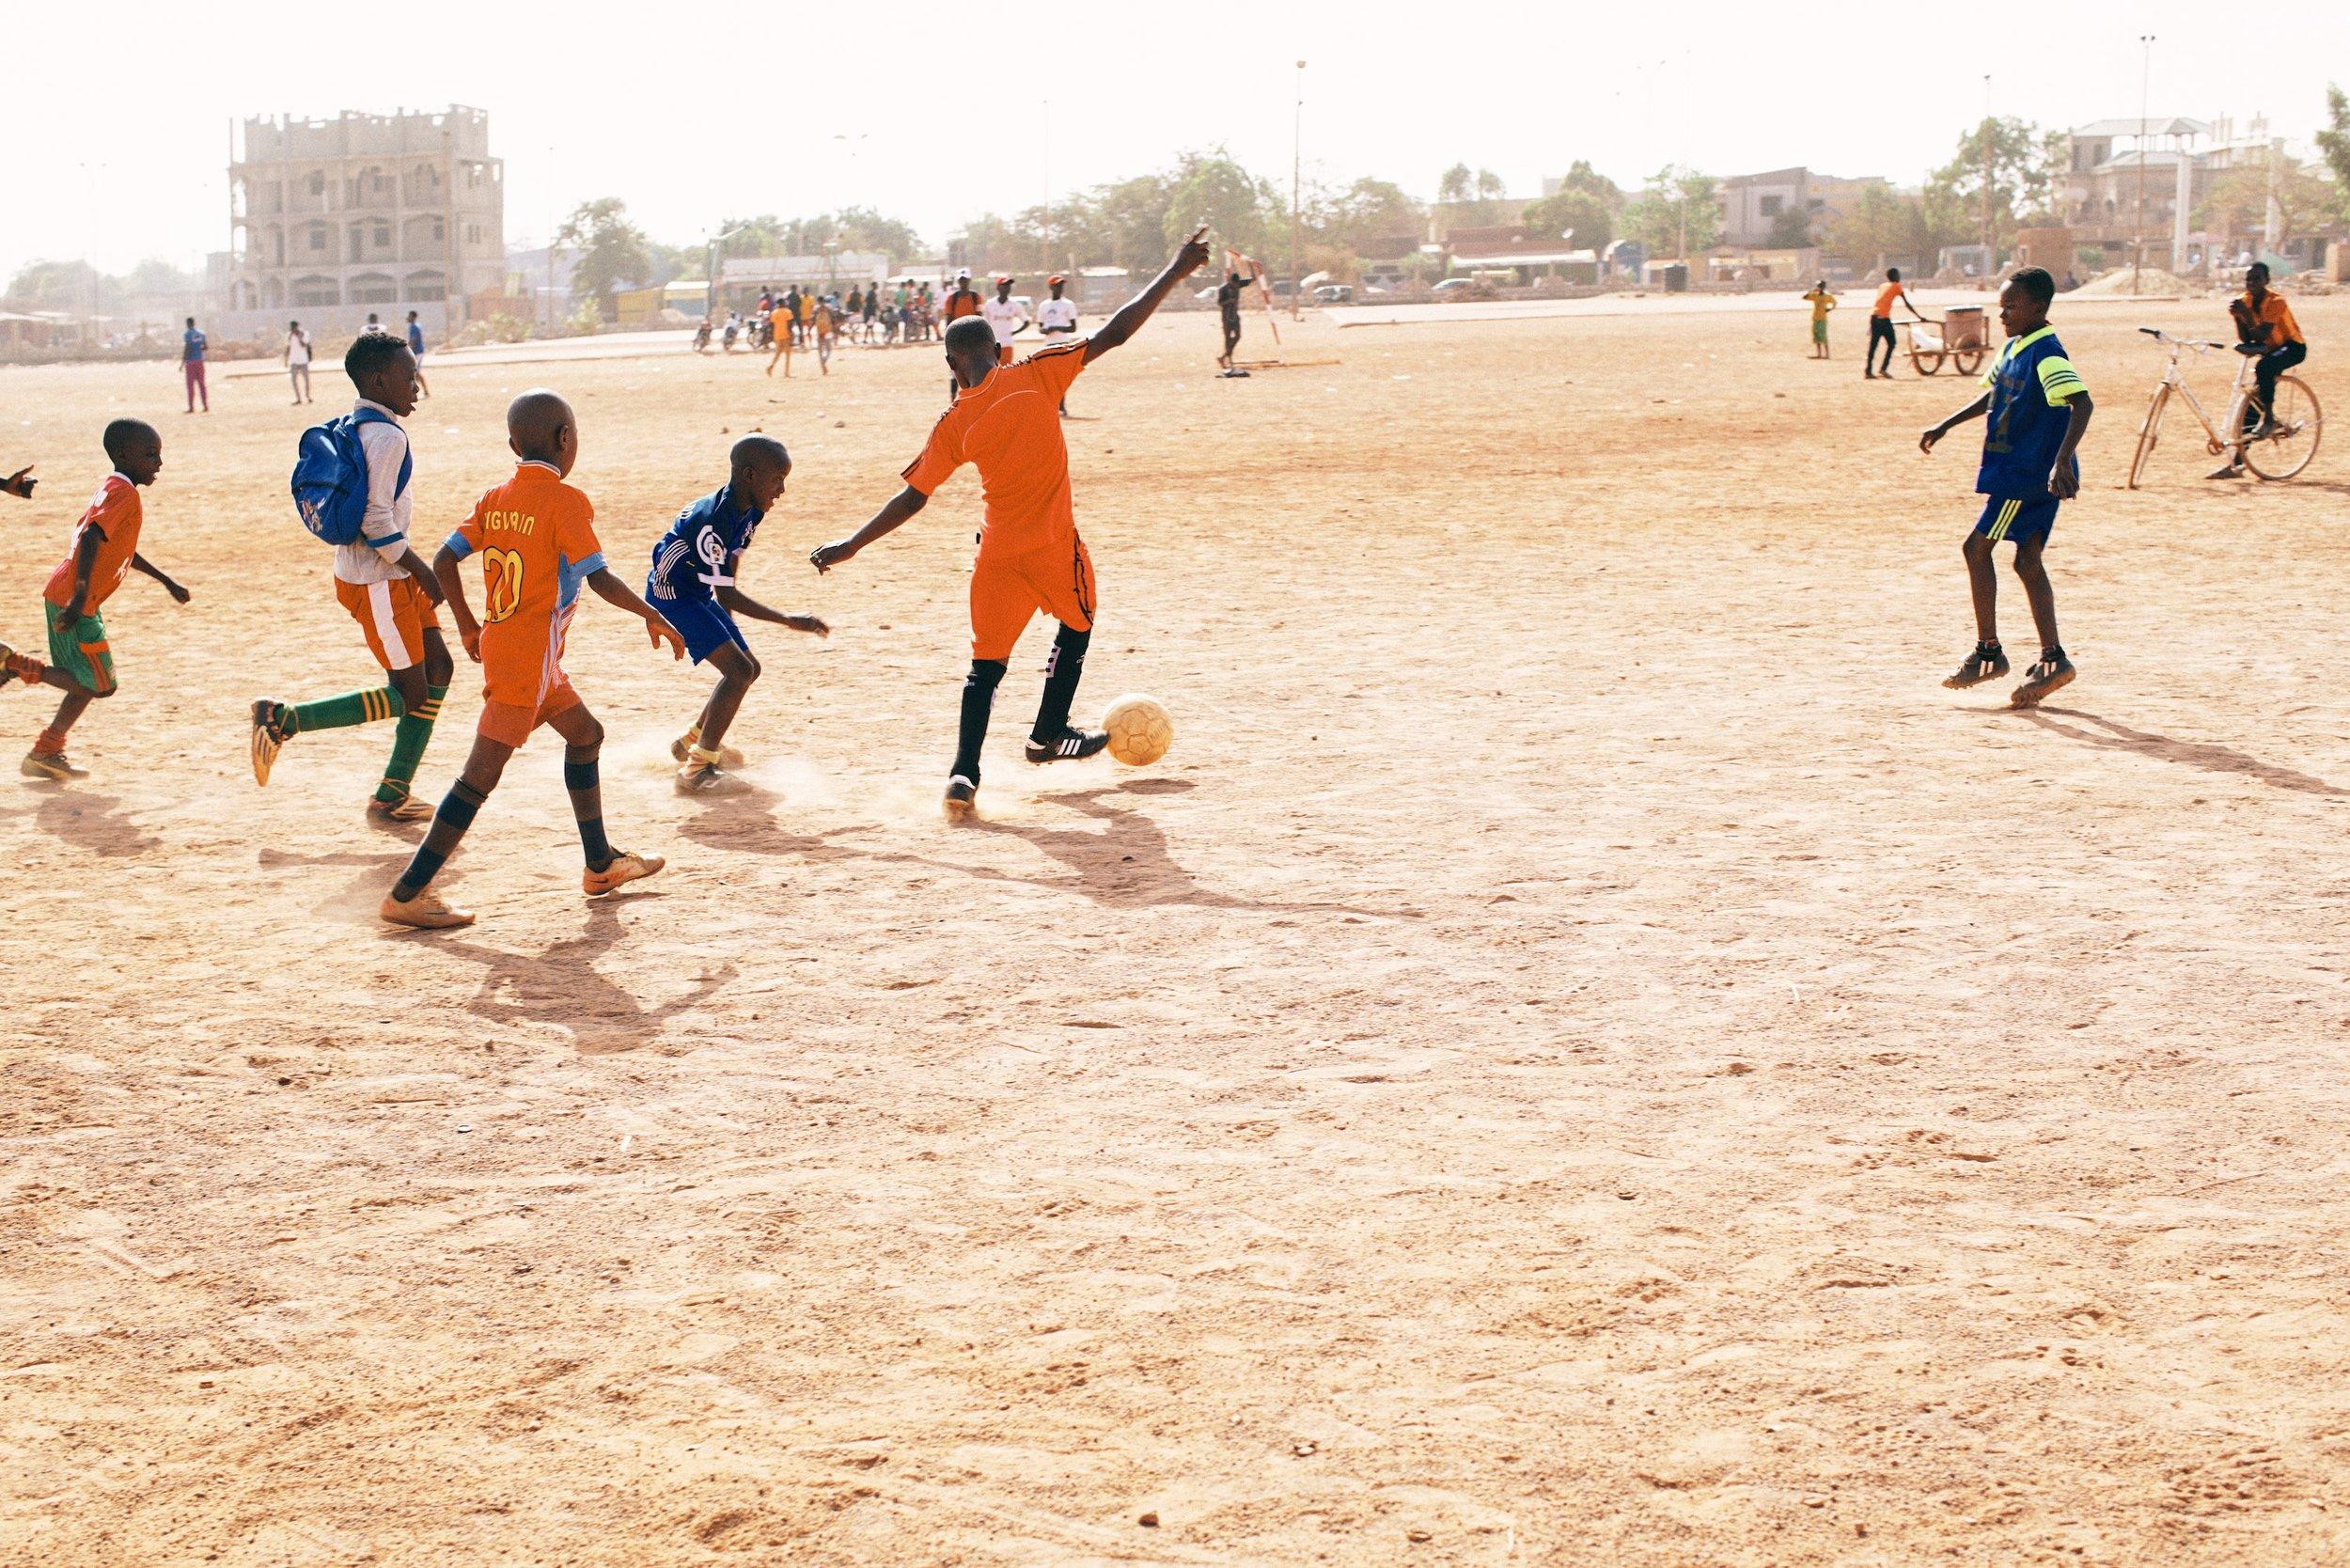 Stockdale_Ouagadougou37.jpg